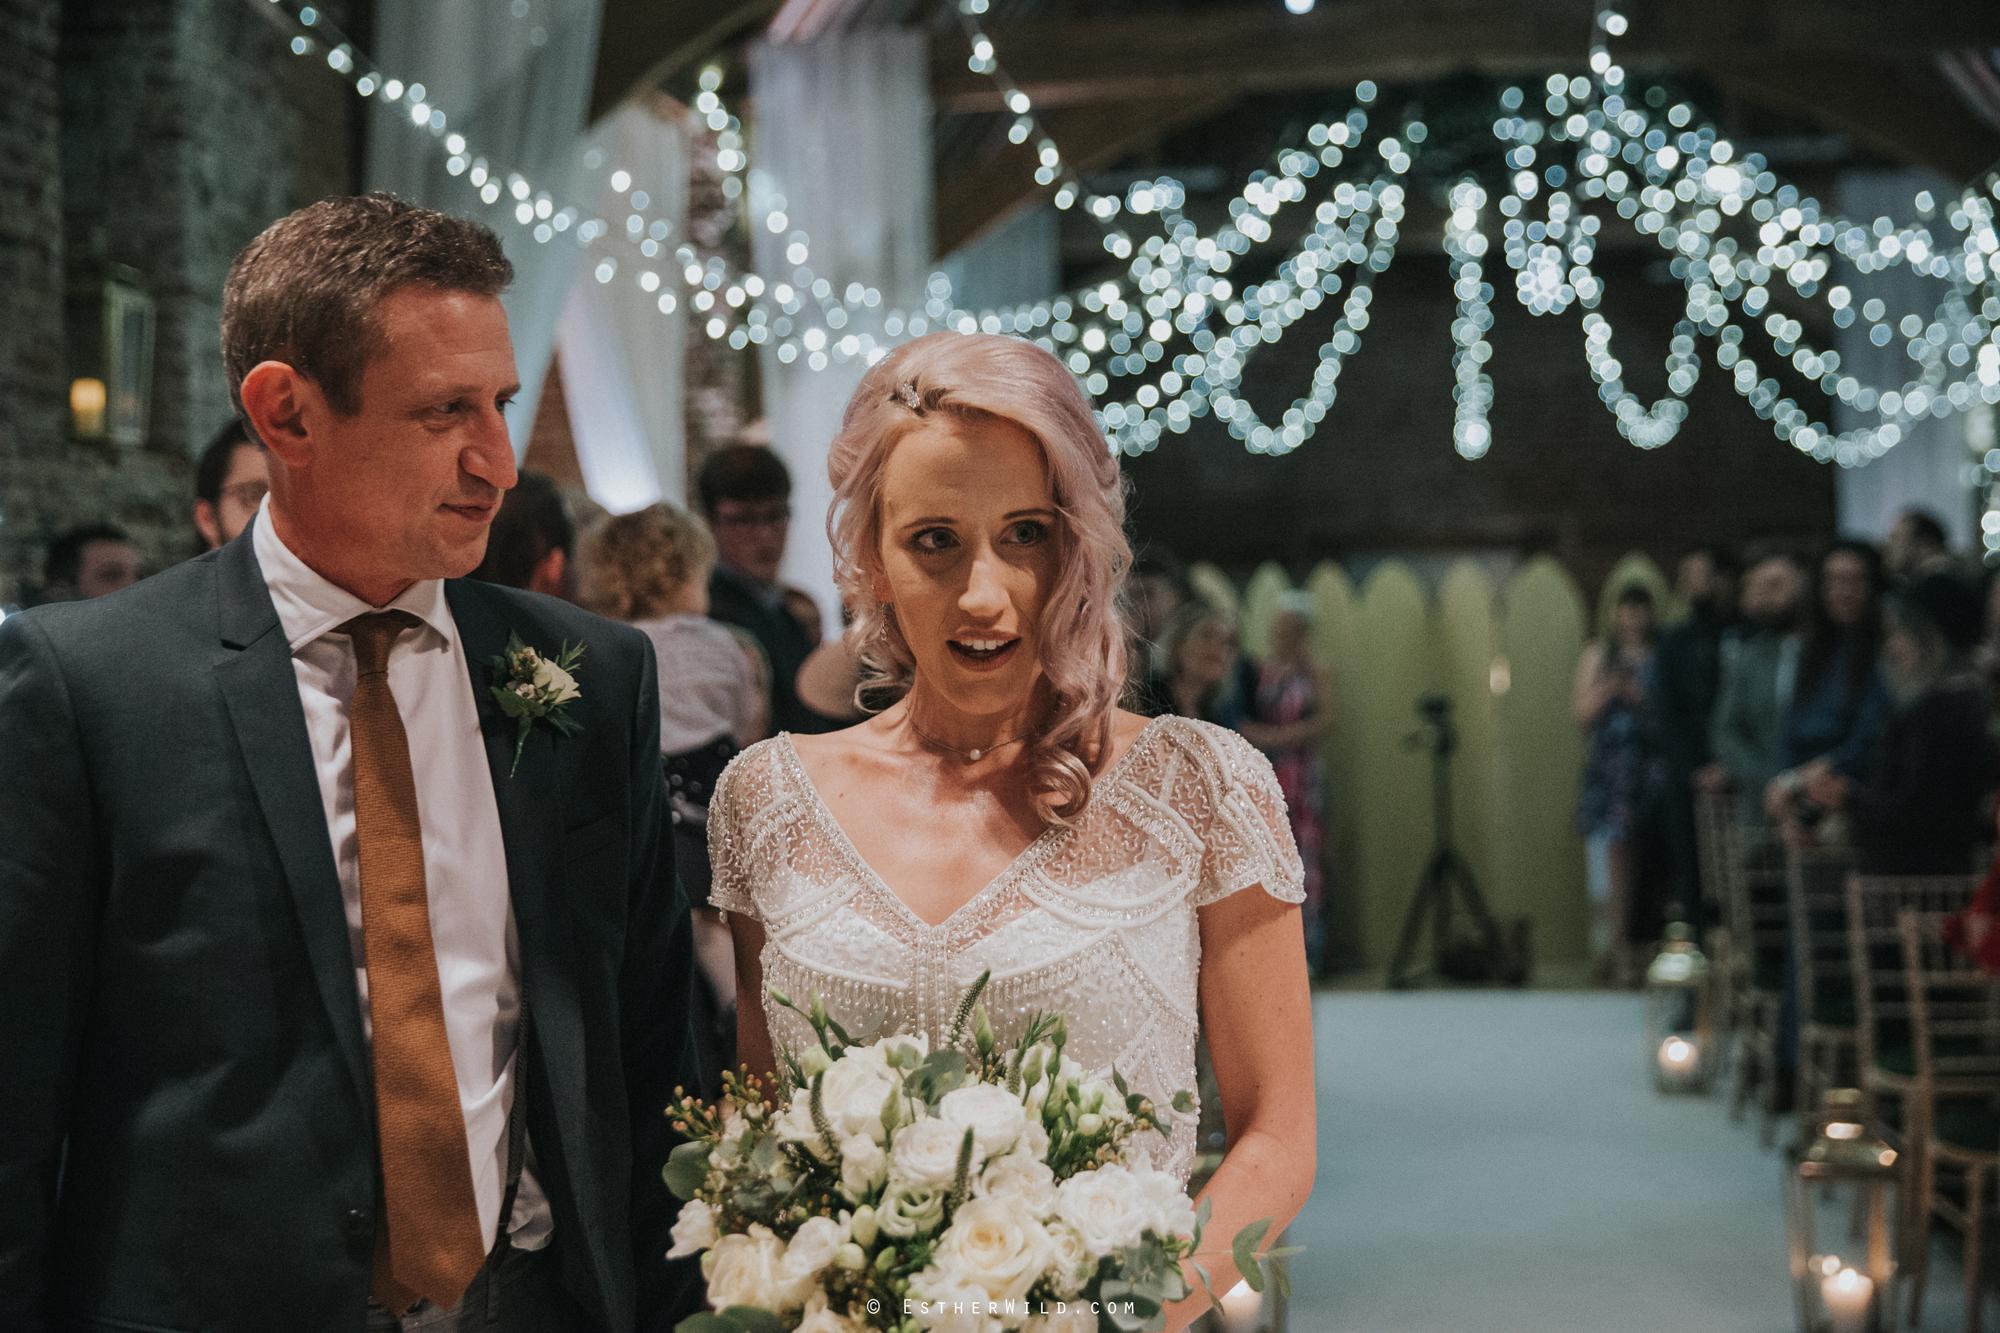 Elms_Barn_Weddings_Suffolk_Photographer_Copyright_Esther_Wild_IMG_1074.jpg